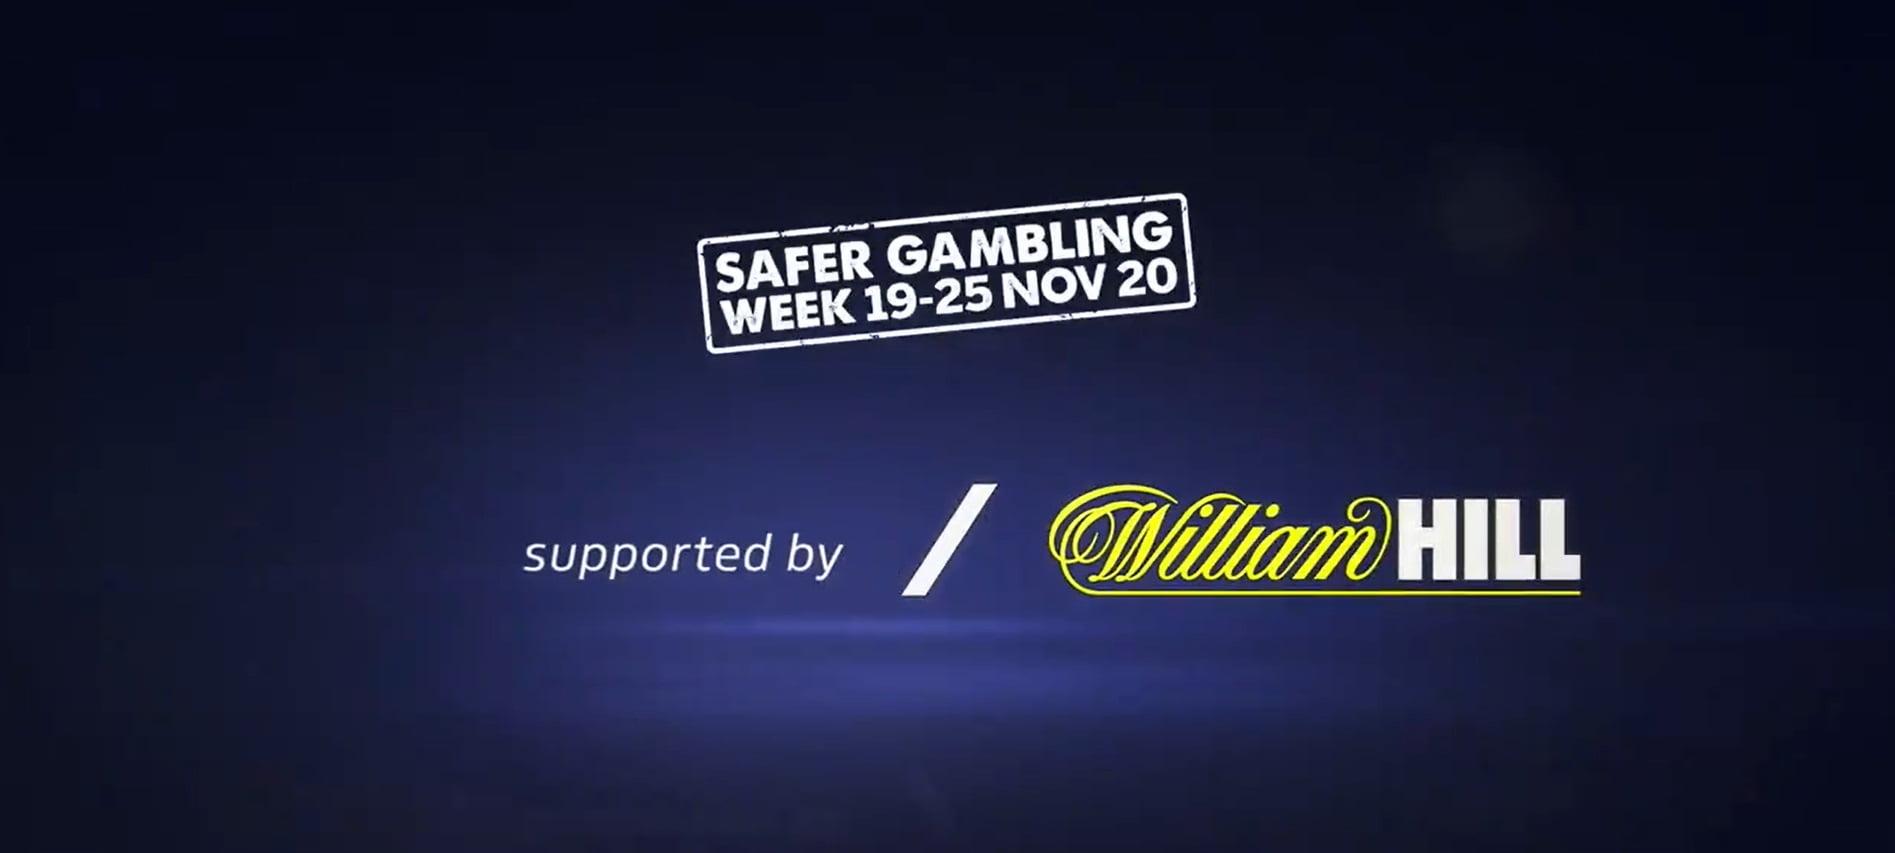 William Hill Gets Behind Safer Gambling Week-#SGWeek20